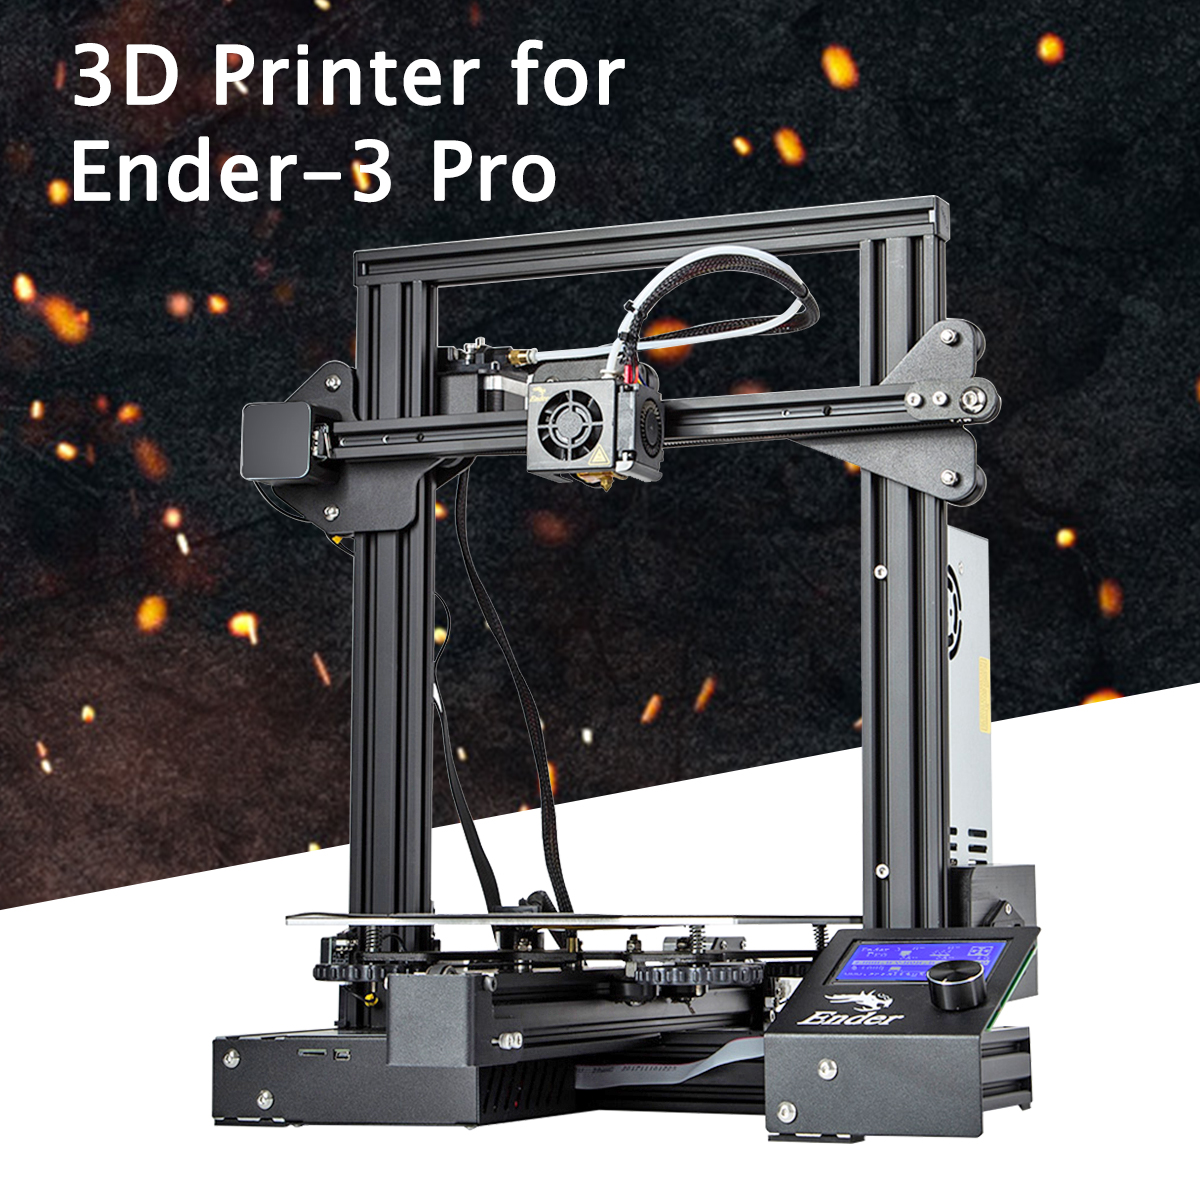 Ender 3 Pro V slot Pru sa I3 DIY 3D Printer Kit 220x220x250mm Printing Size With